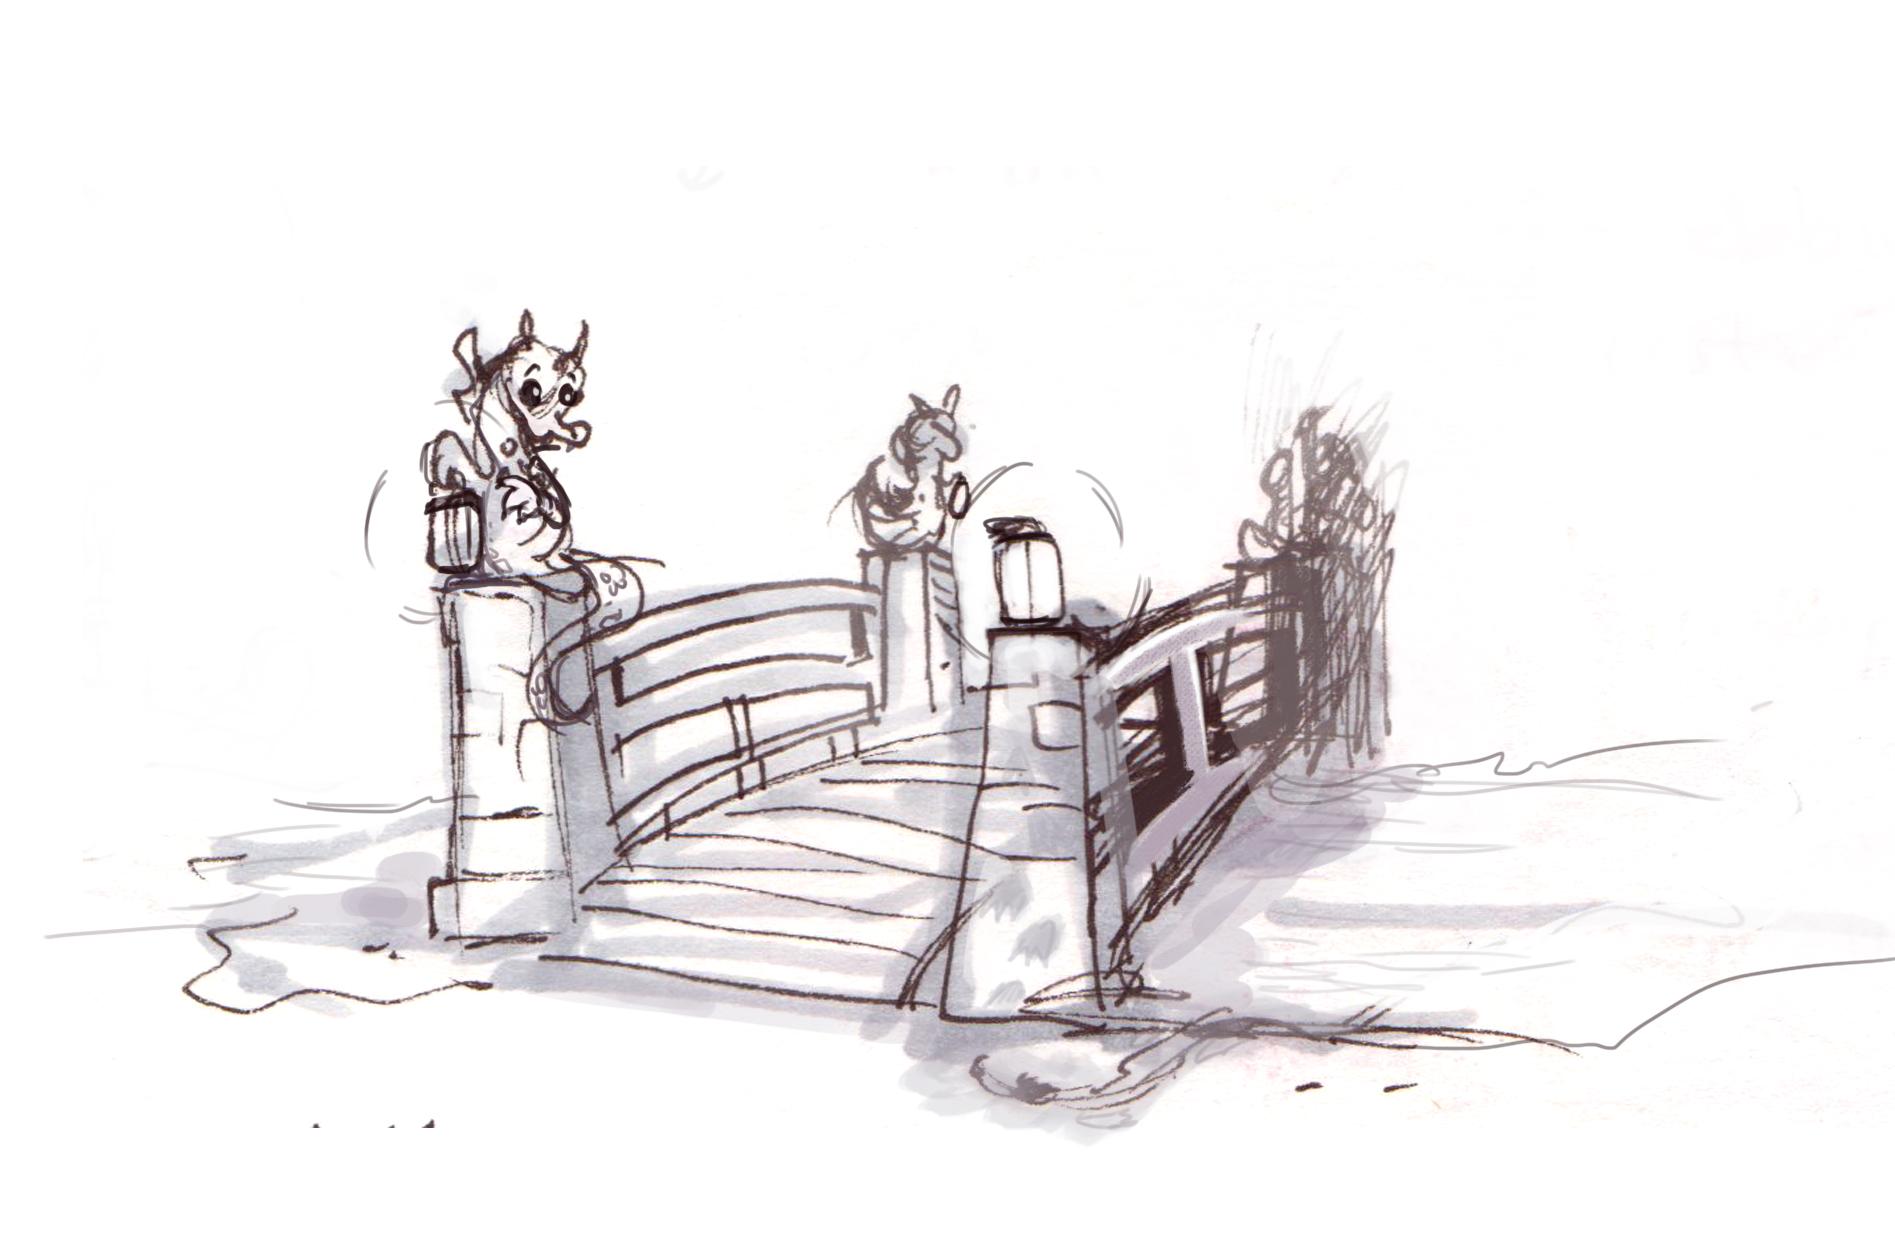 A bridge by the swamp pool